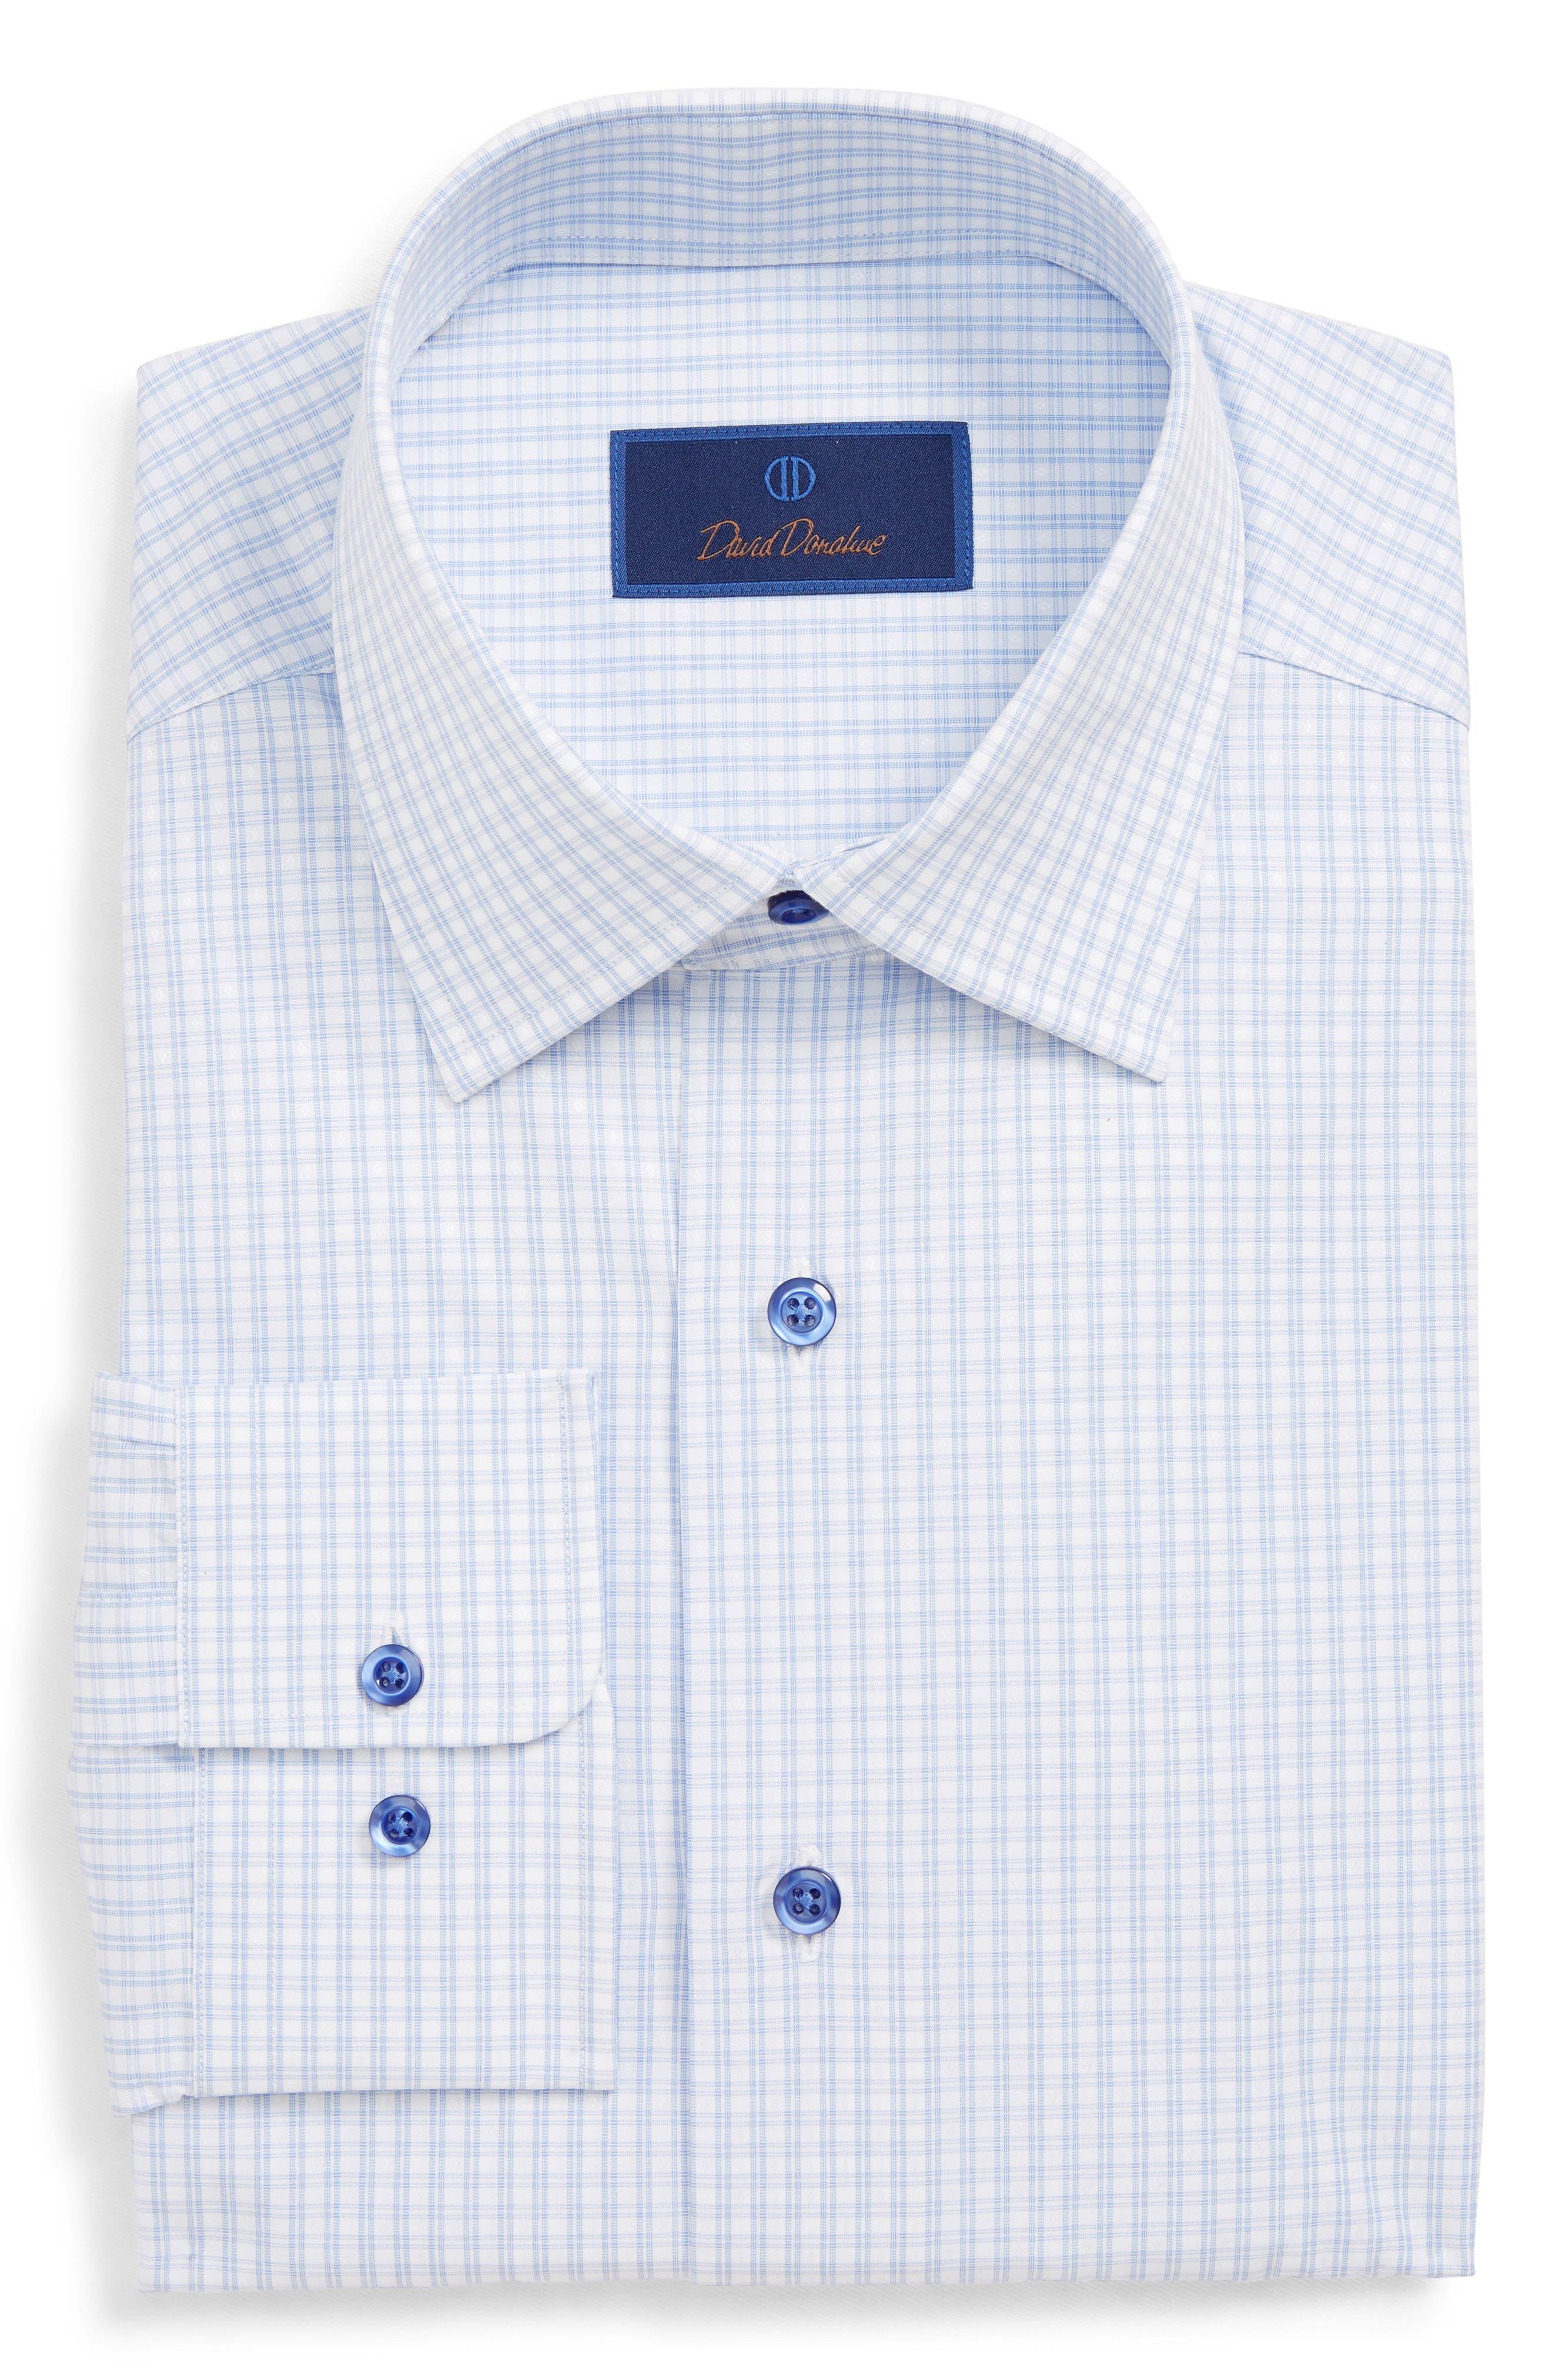 DAVID DONAHUE, Regular Fit Plaid Dress Shirt, Main thumbnail 1, color, BLUE